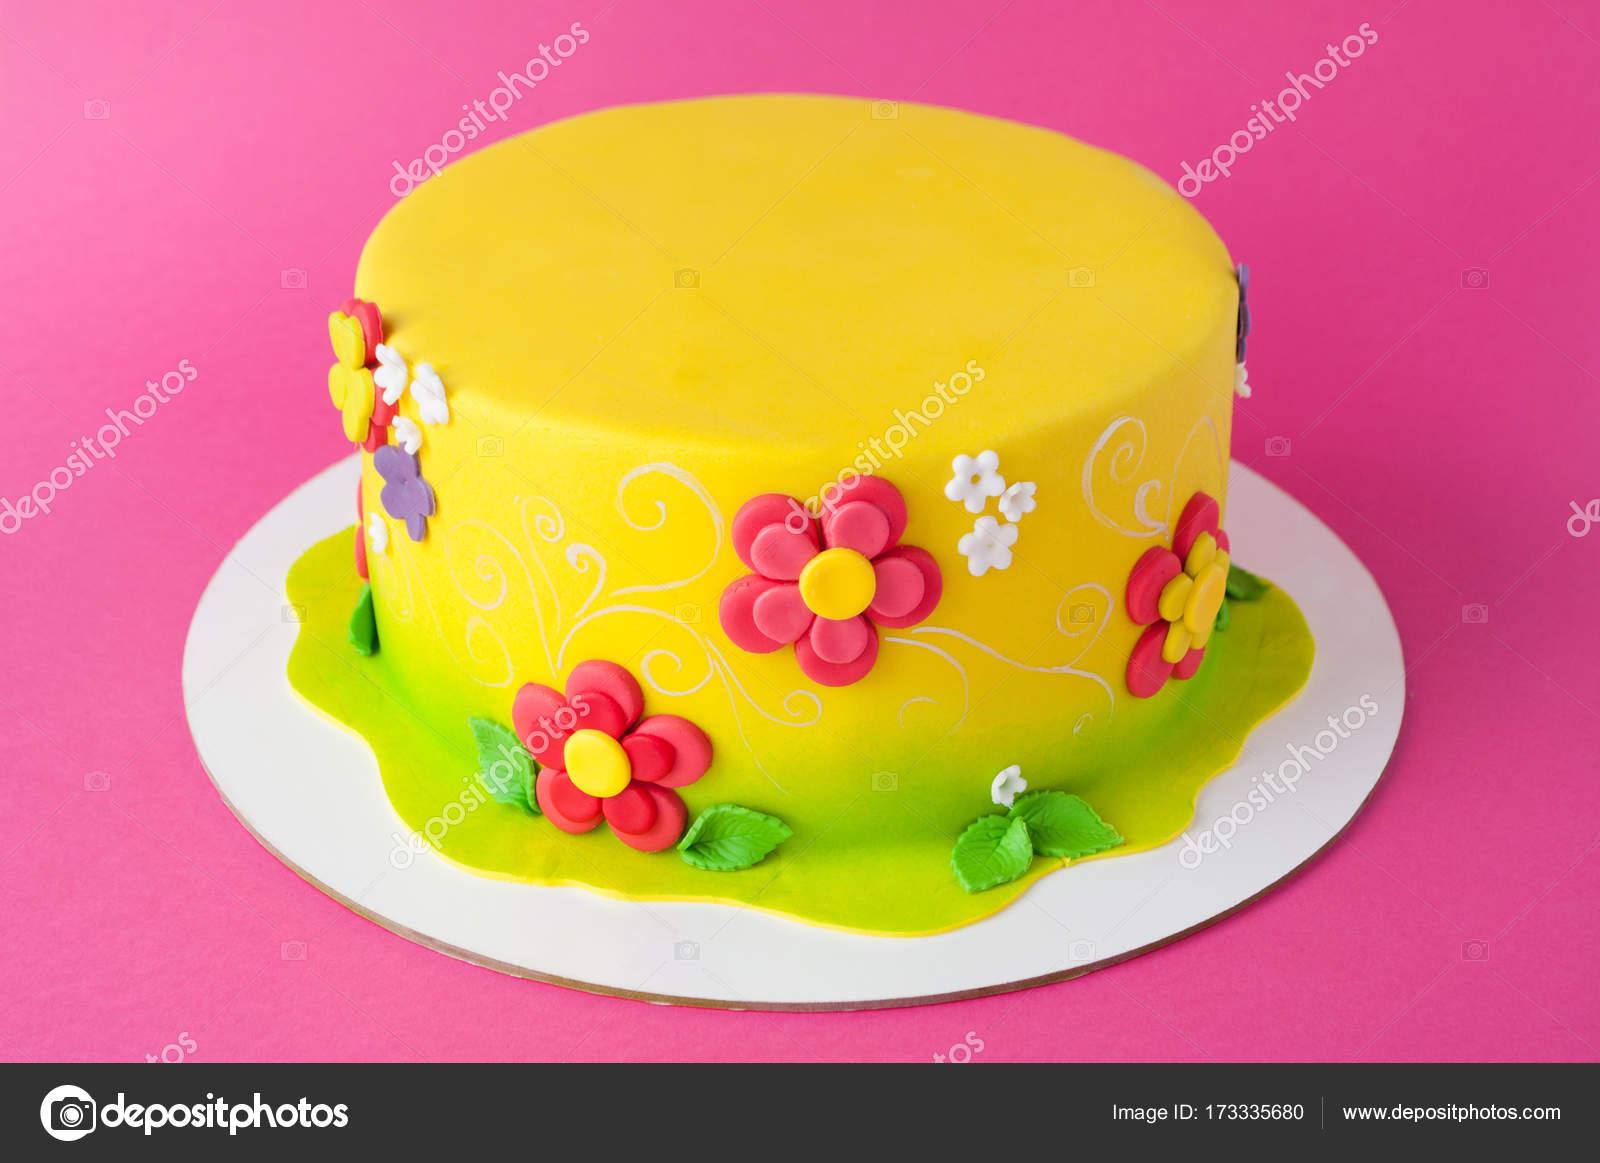 Enjoyable Colorful Childrens Birthday Cake Made Of Yellow Mastic Decorated Funny Birthday Cards Online Ioscodamsfinfo